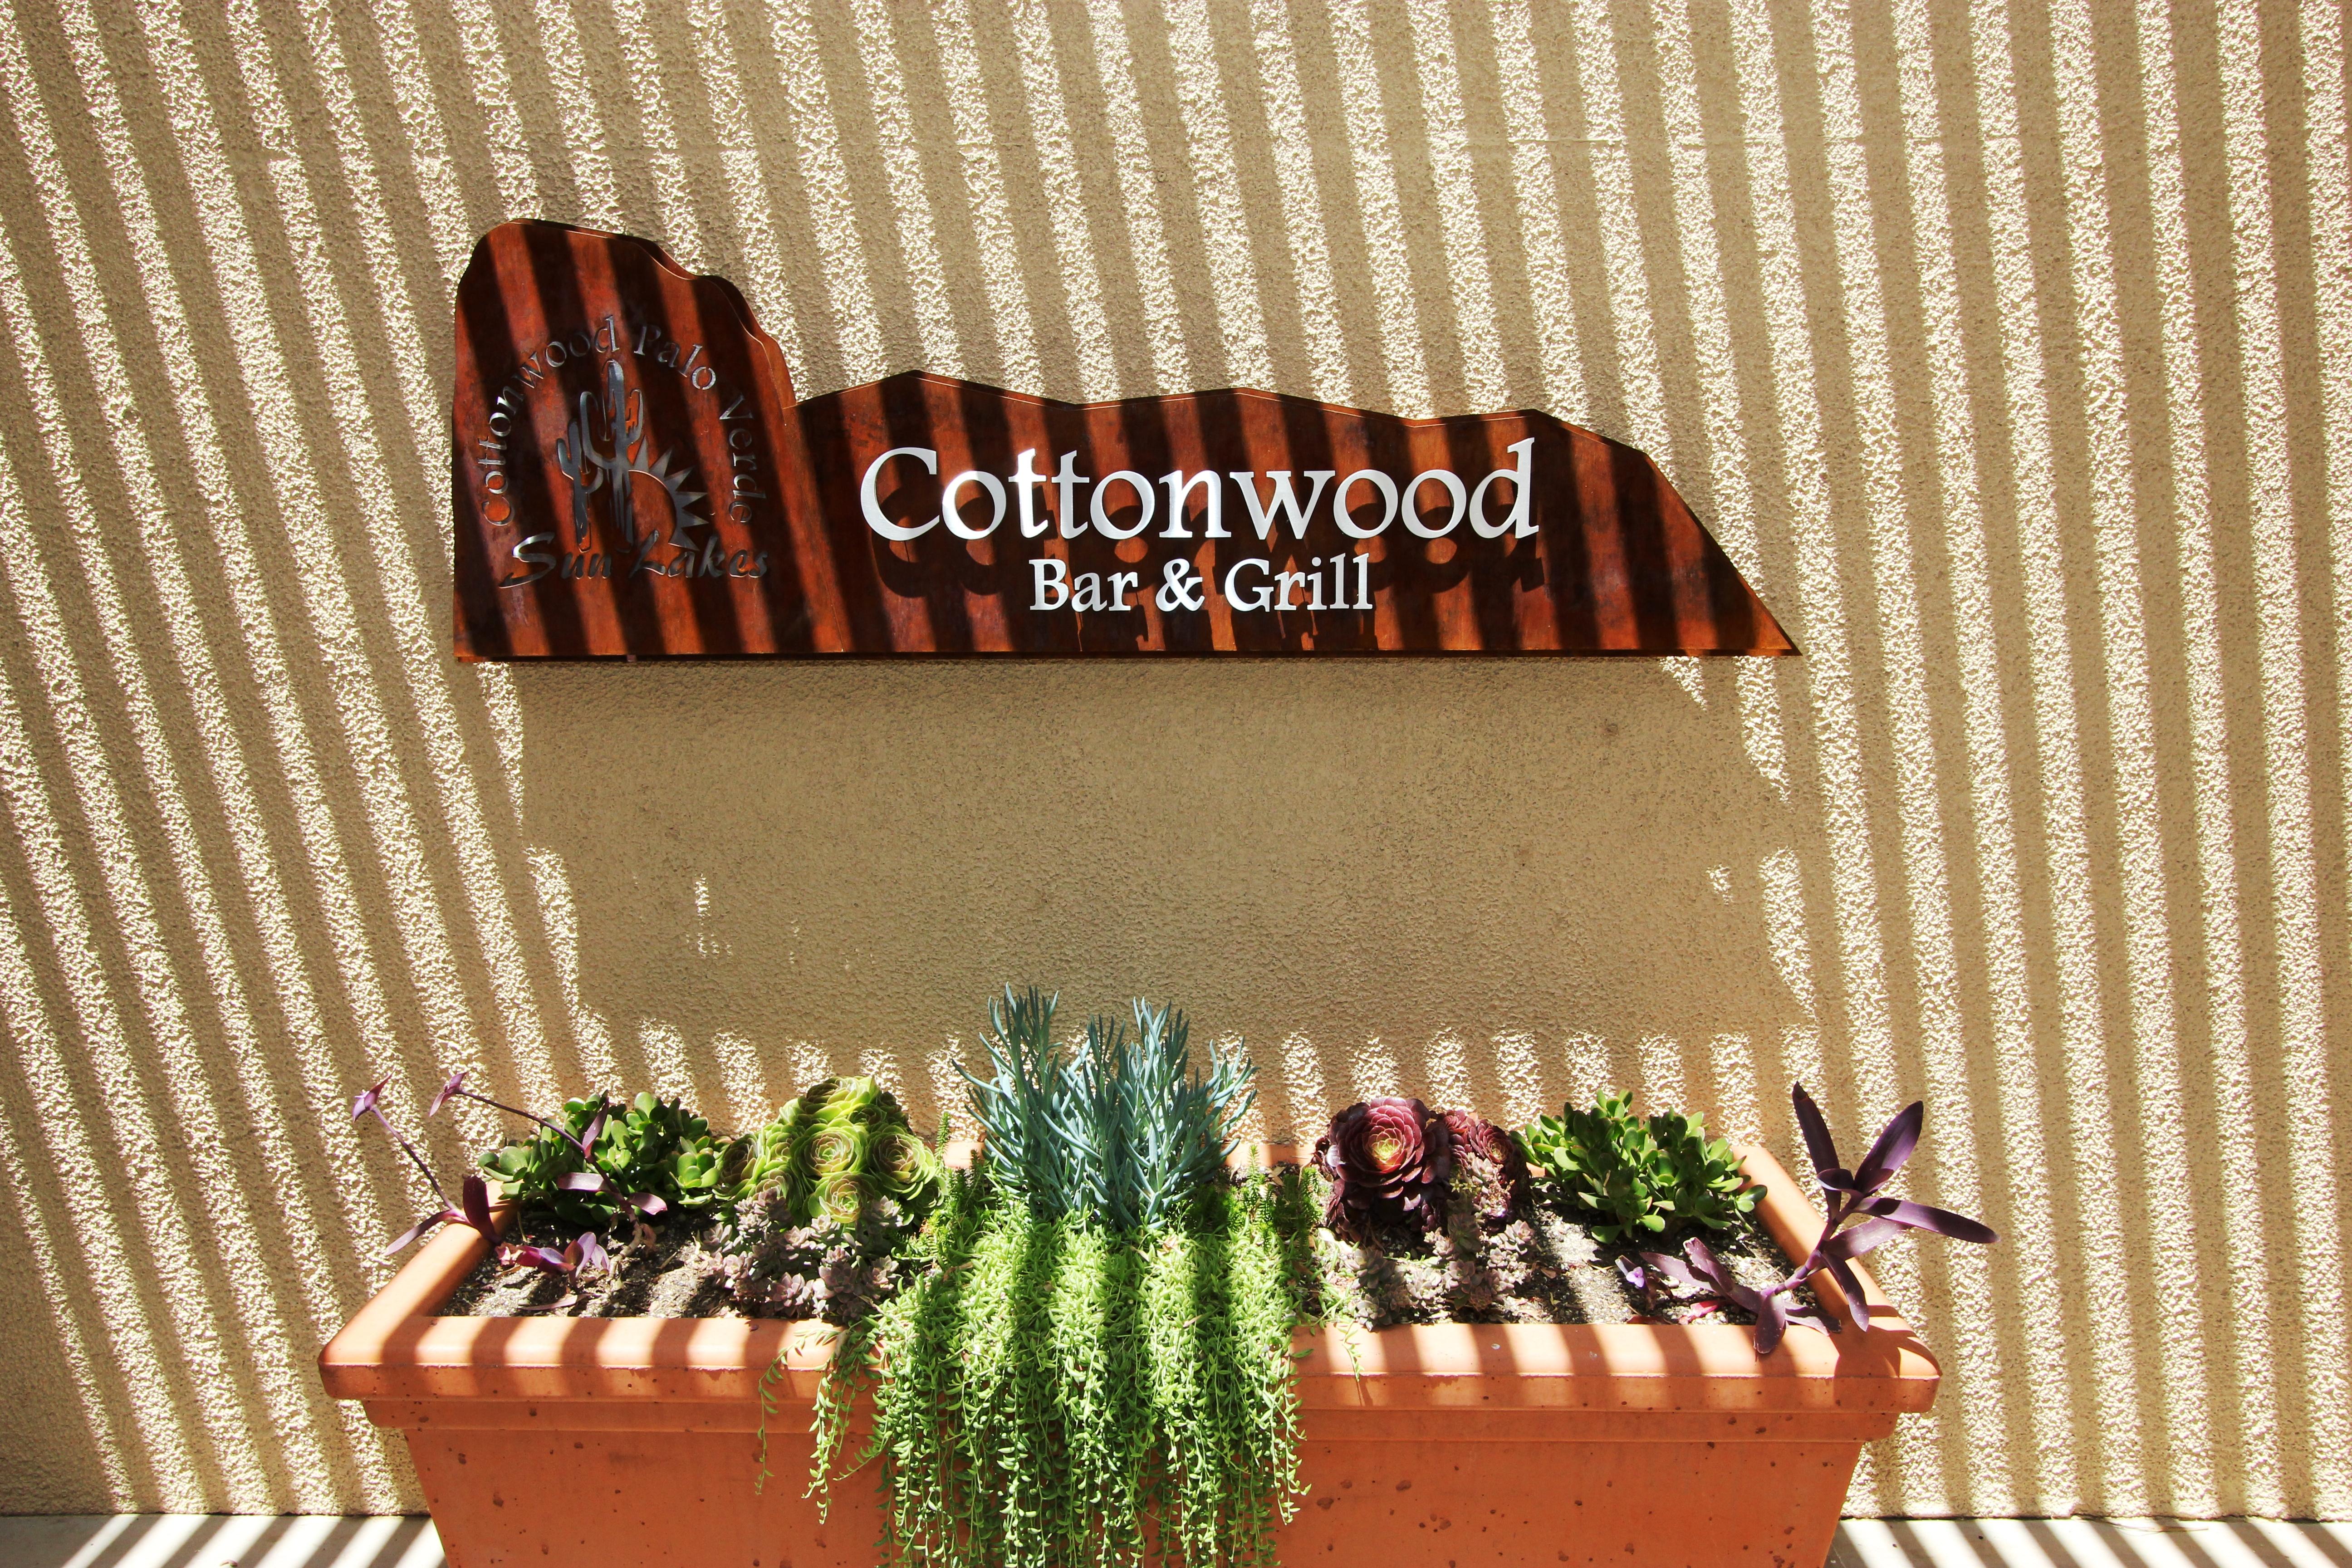 4 Cottonwood Bar & Grill